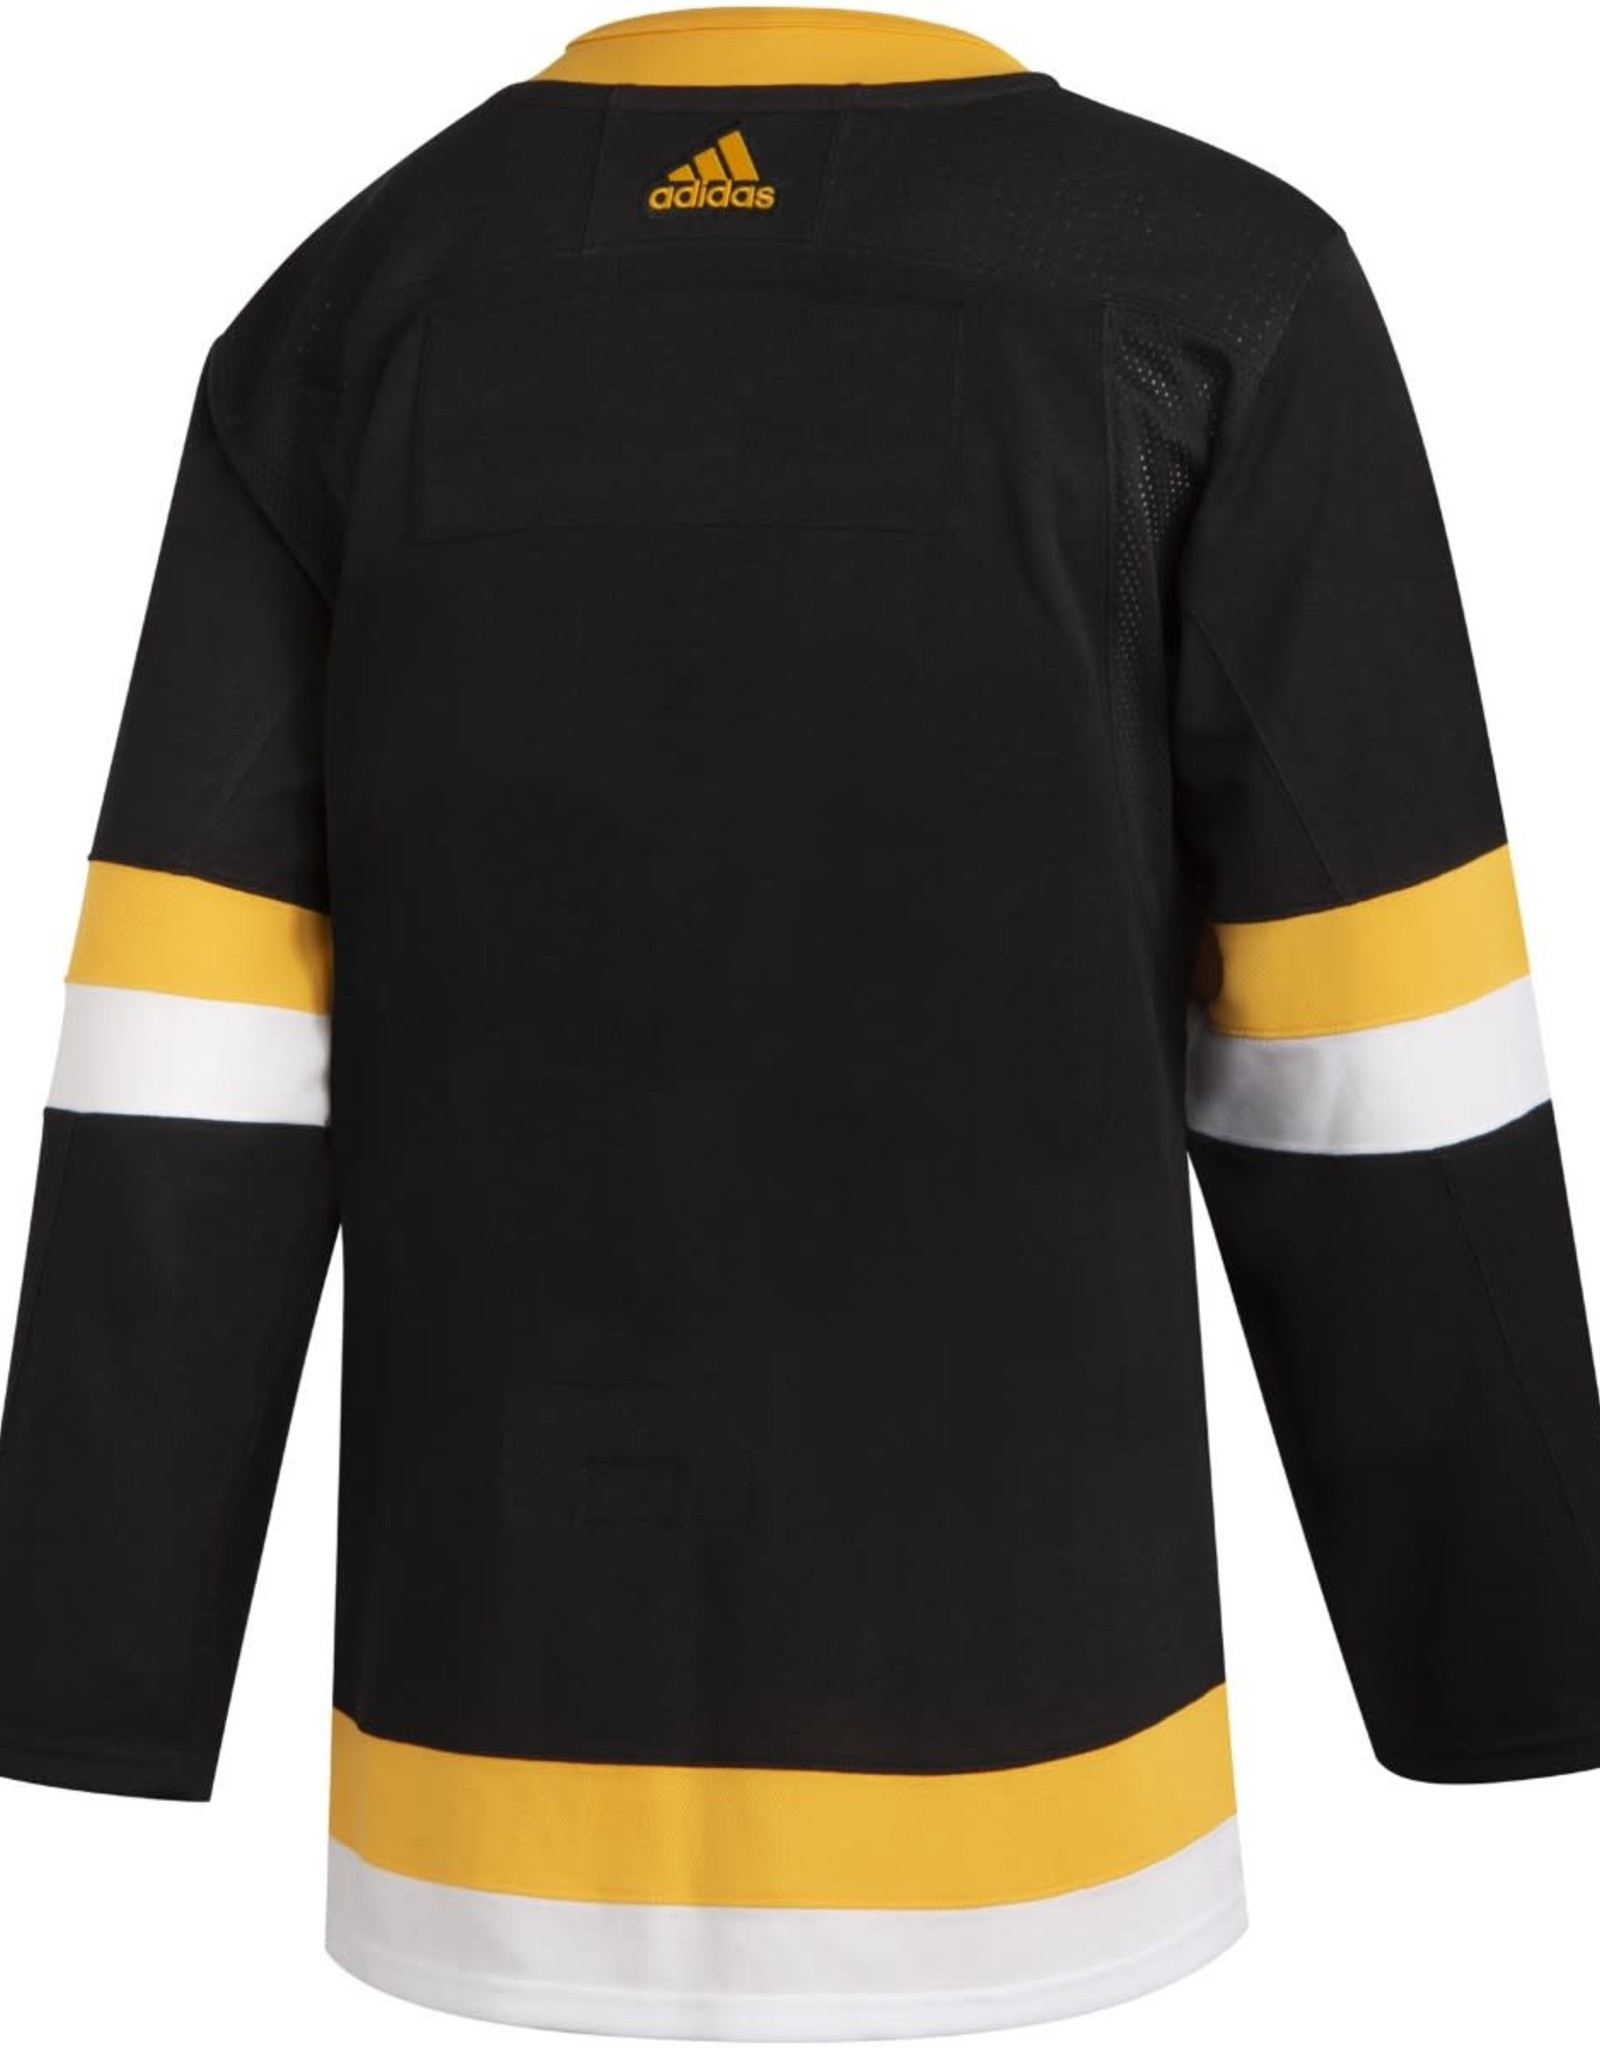 Adidas Adidas Adult Authentic Alternate Boston Bruins Jersey Black